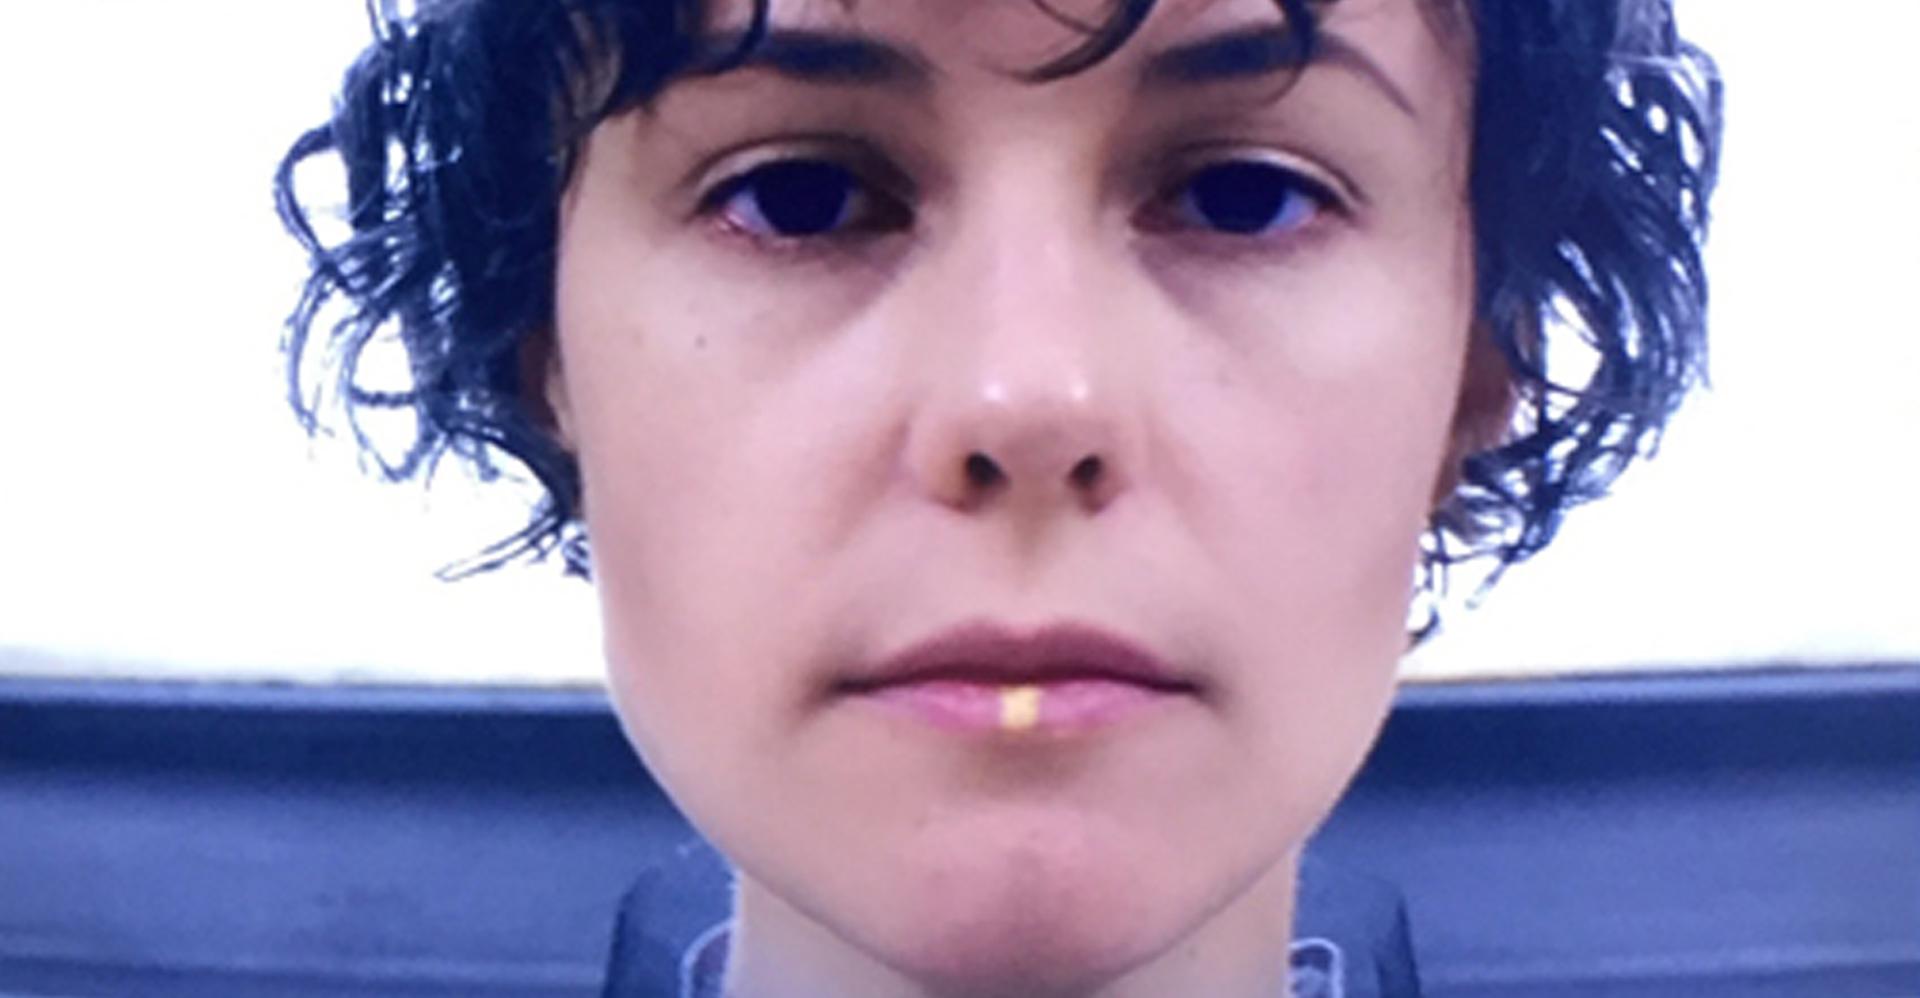 ©, Sophia Brueckner and Rachel Freire, Embodisuit: A Wearable Platform for Embodied Knowledge